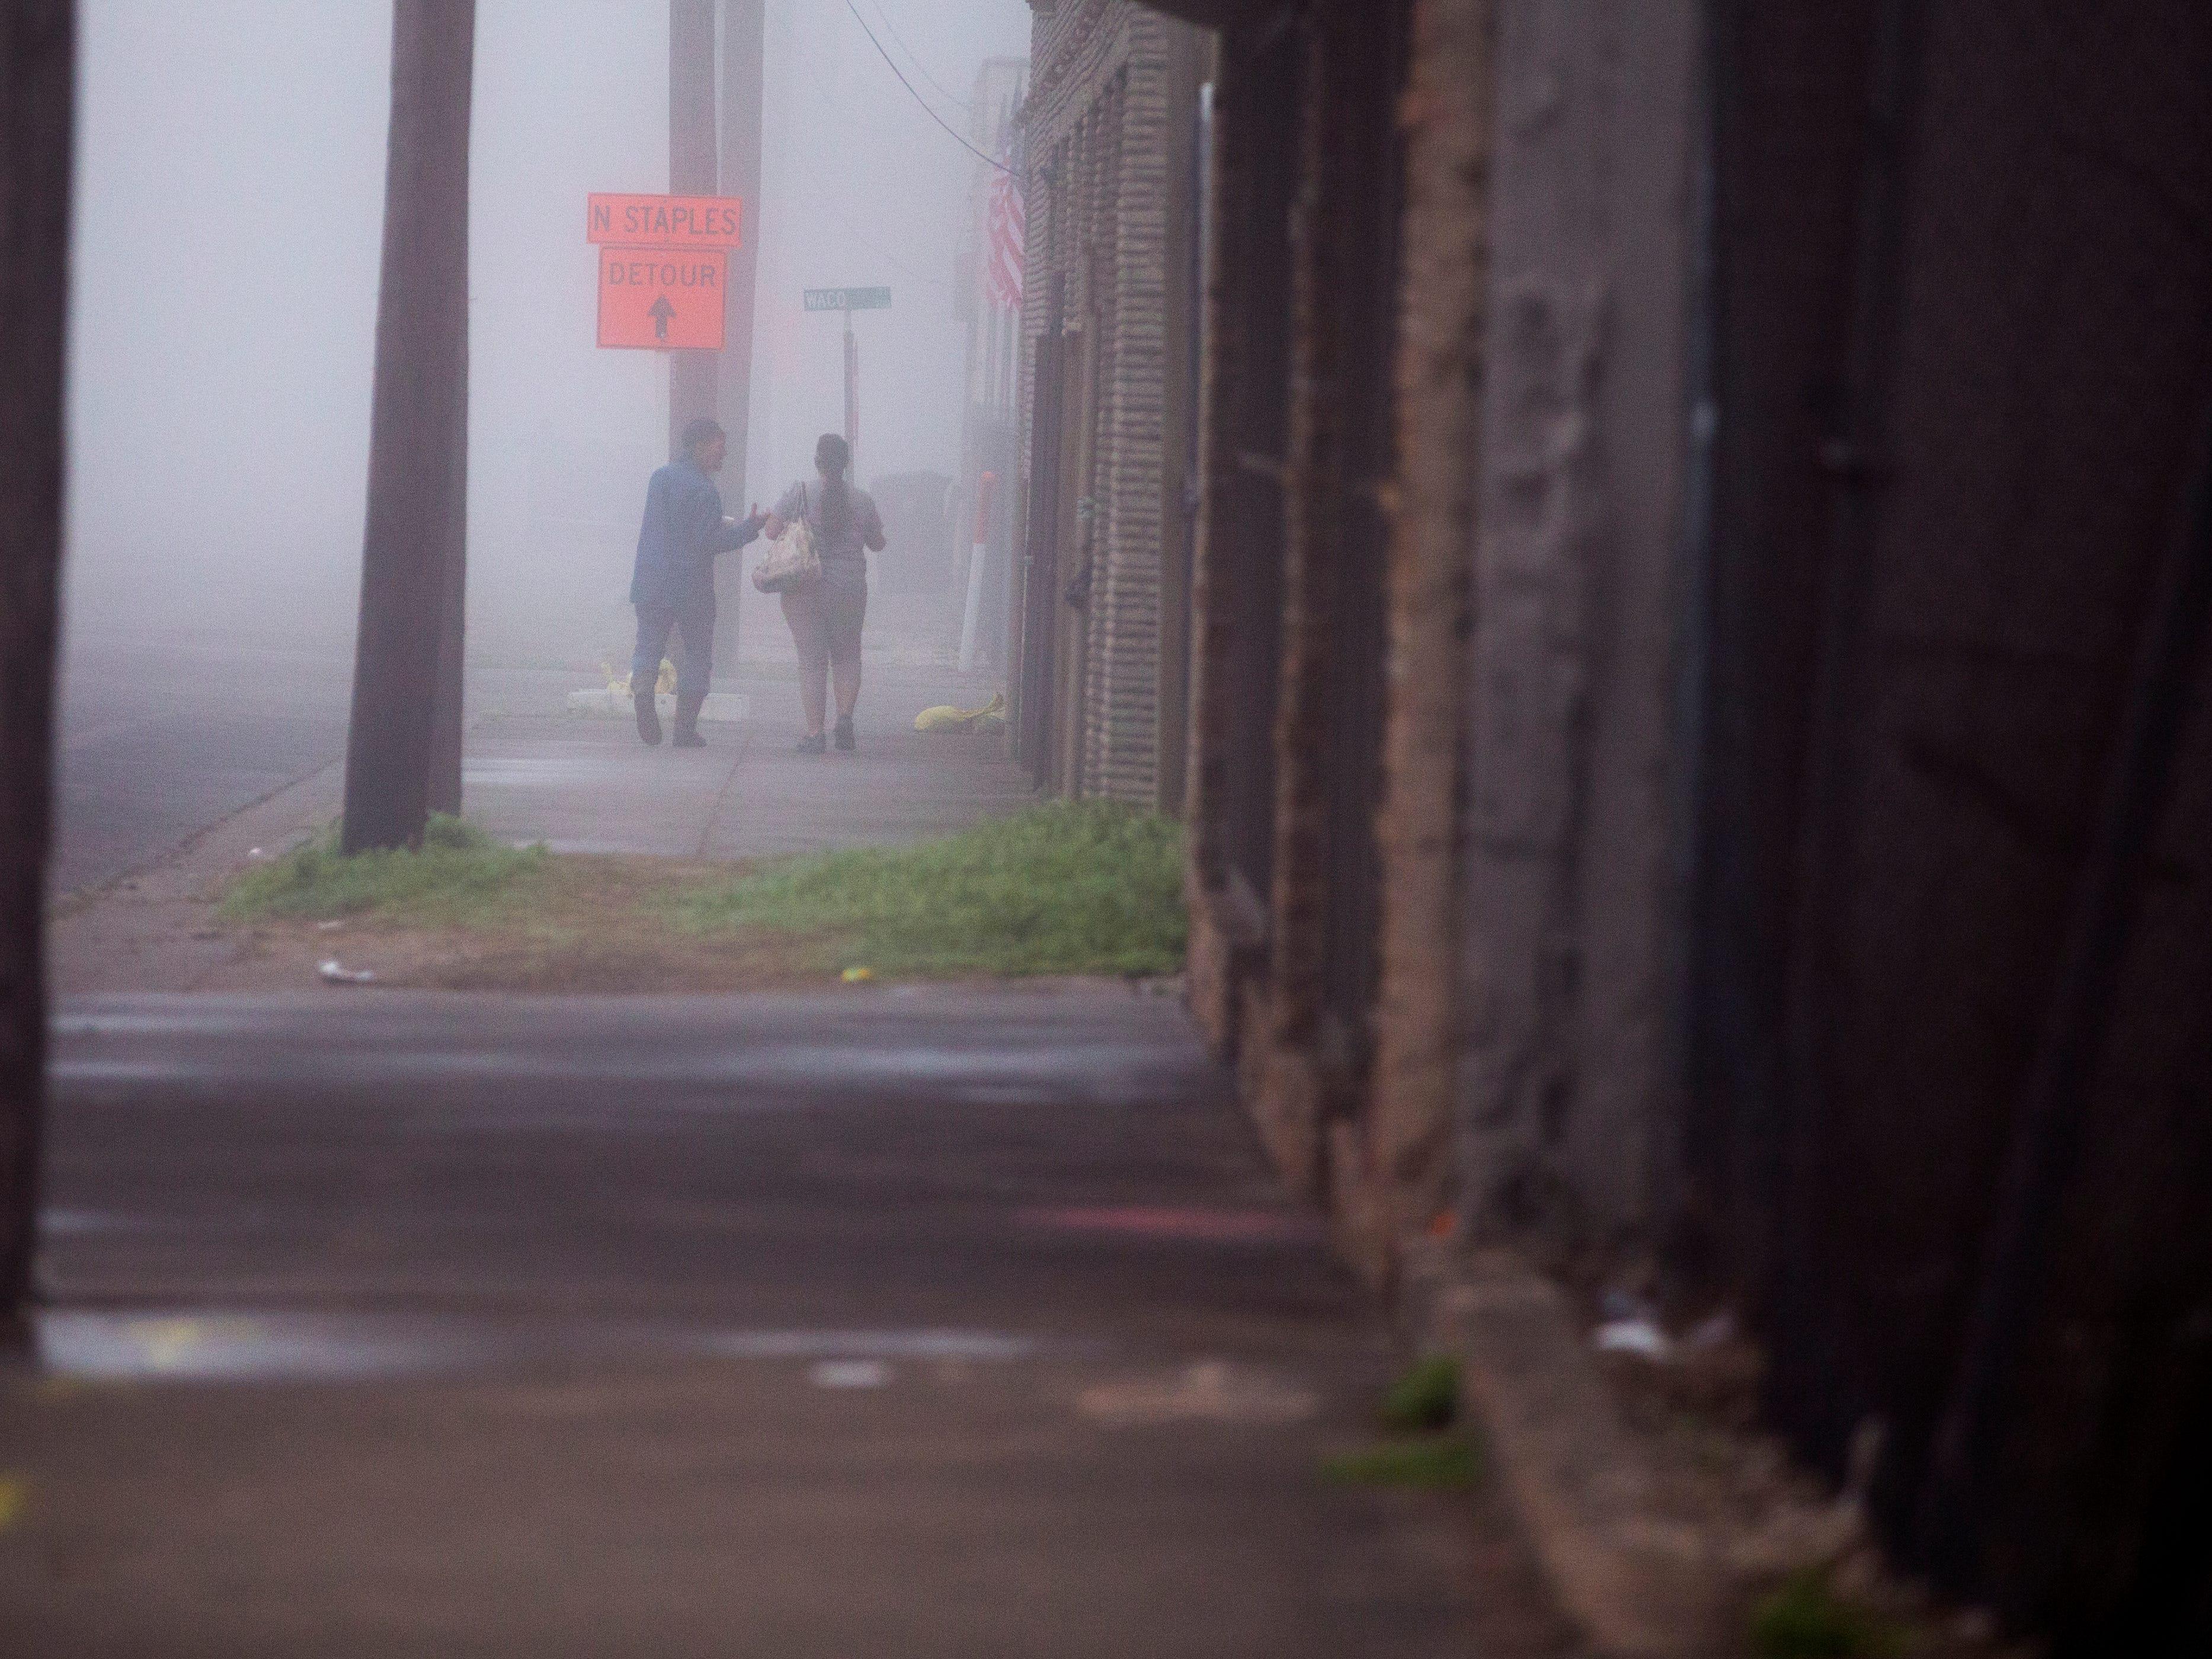 People walk along Antelope Street in heavy fog on Monday, March 11, 2019.